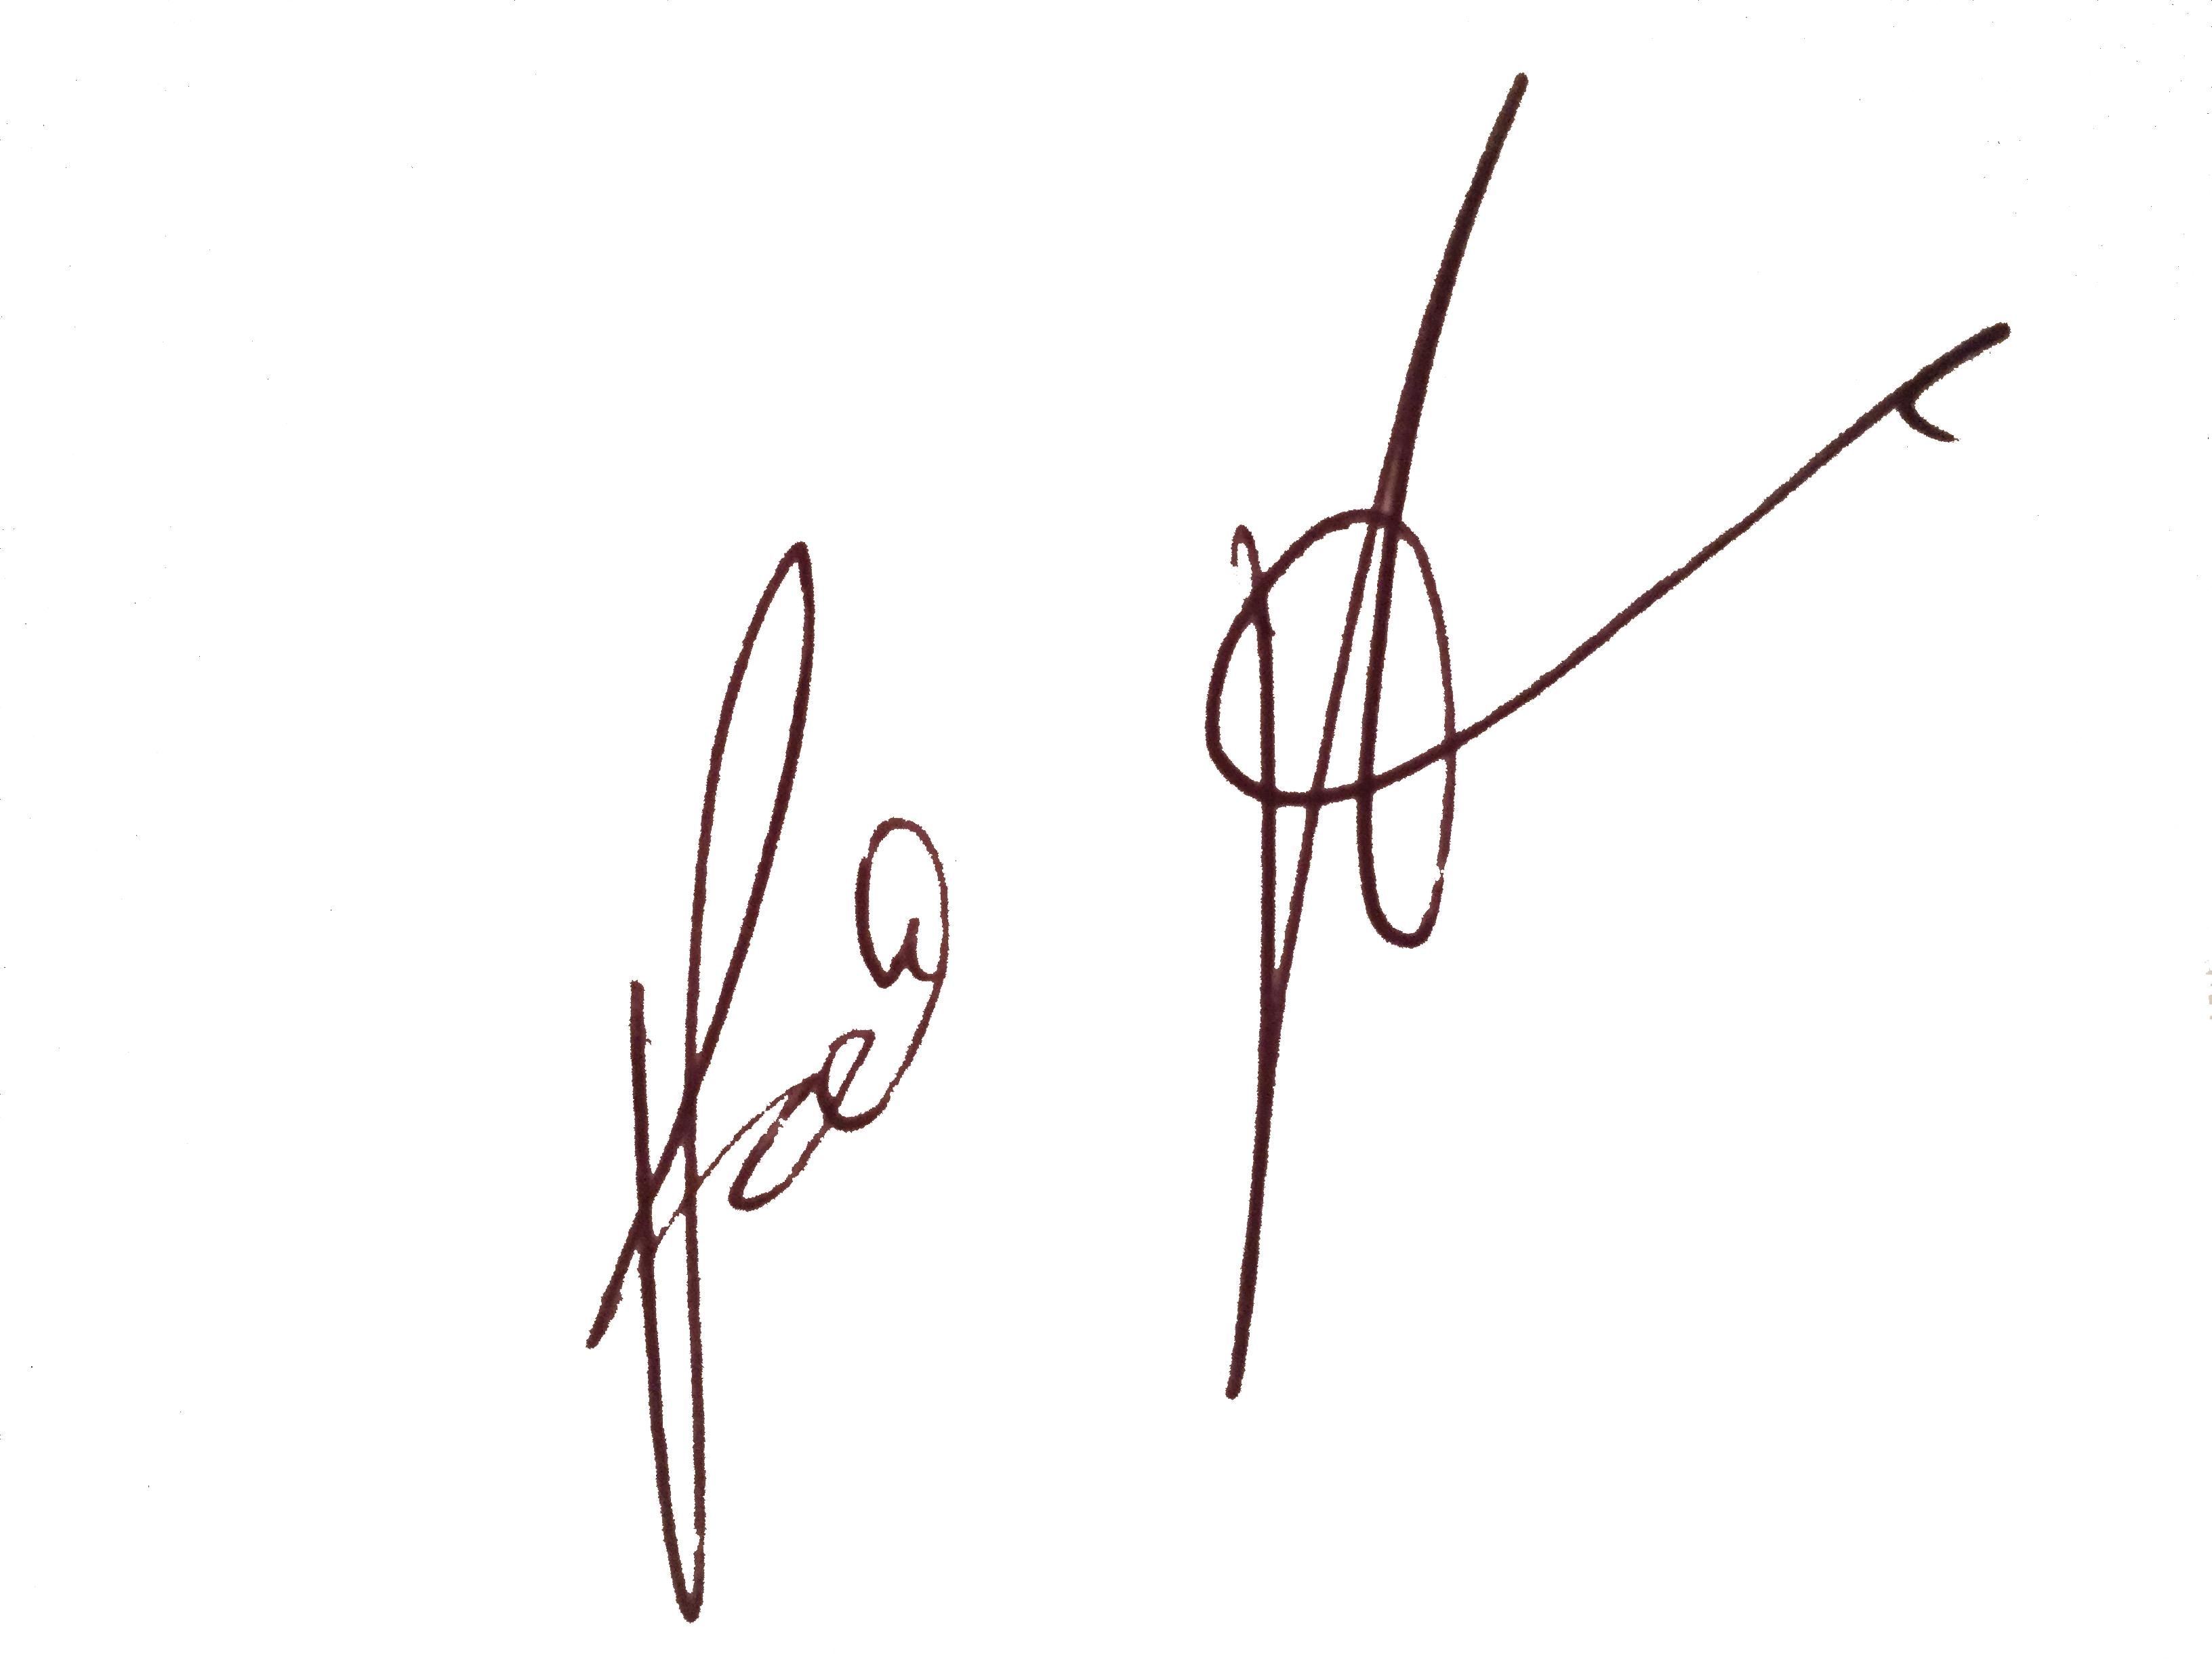 Patrick Pagano's Signature